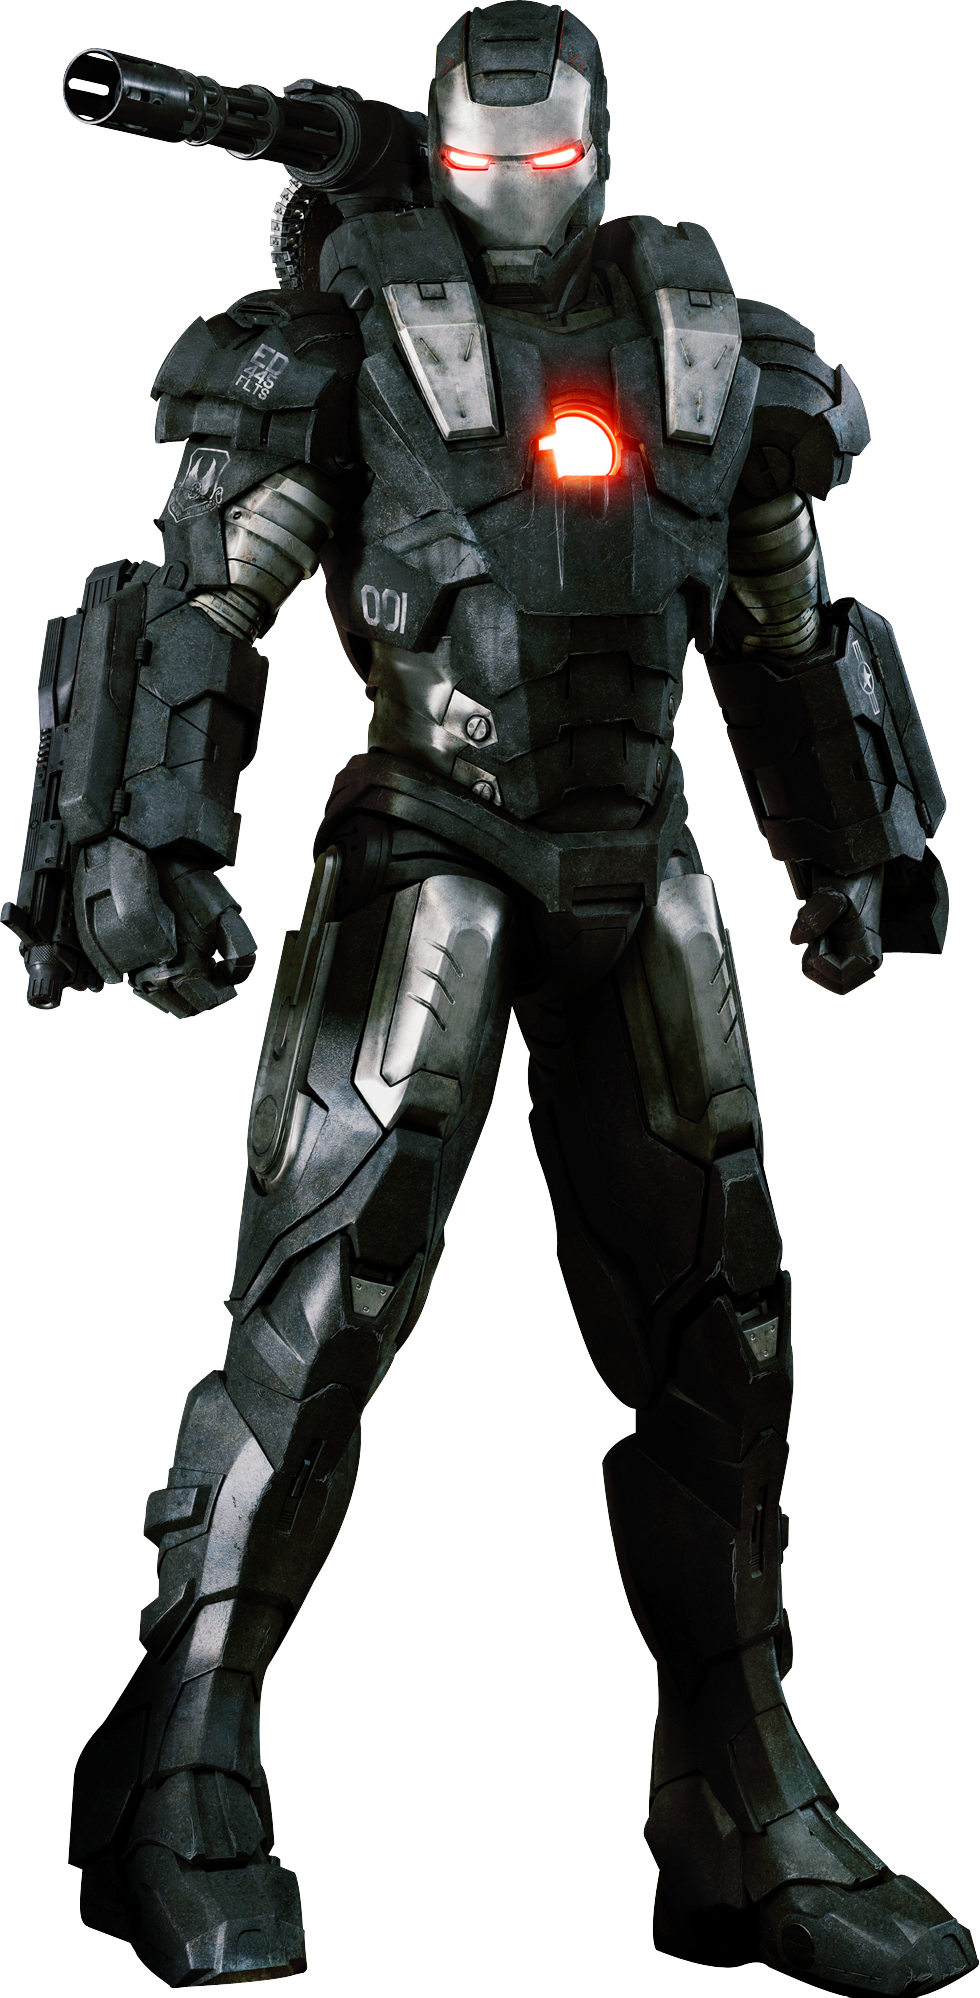 Iron Man 2: War Machine Armor Mark I